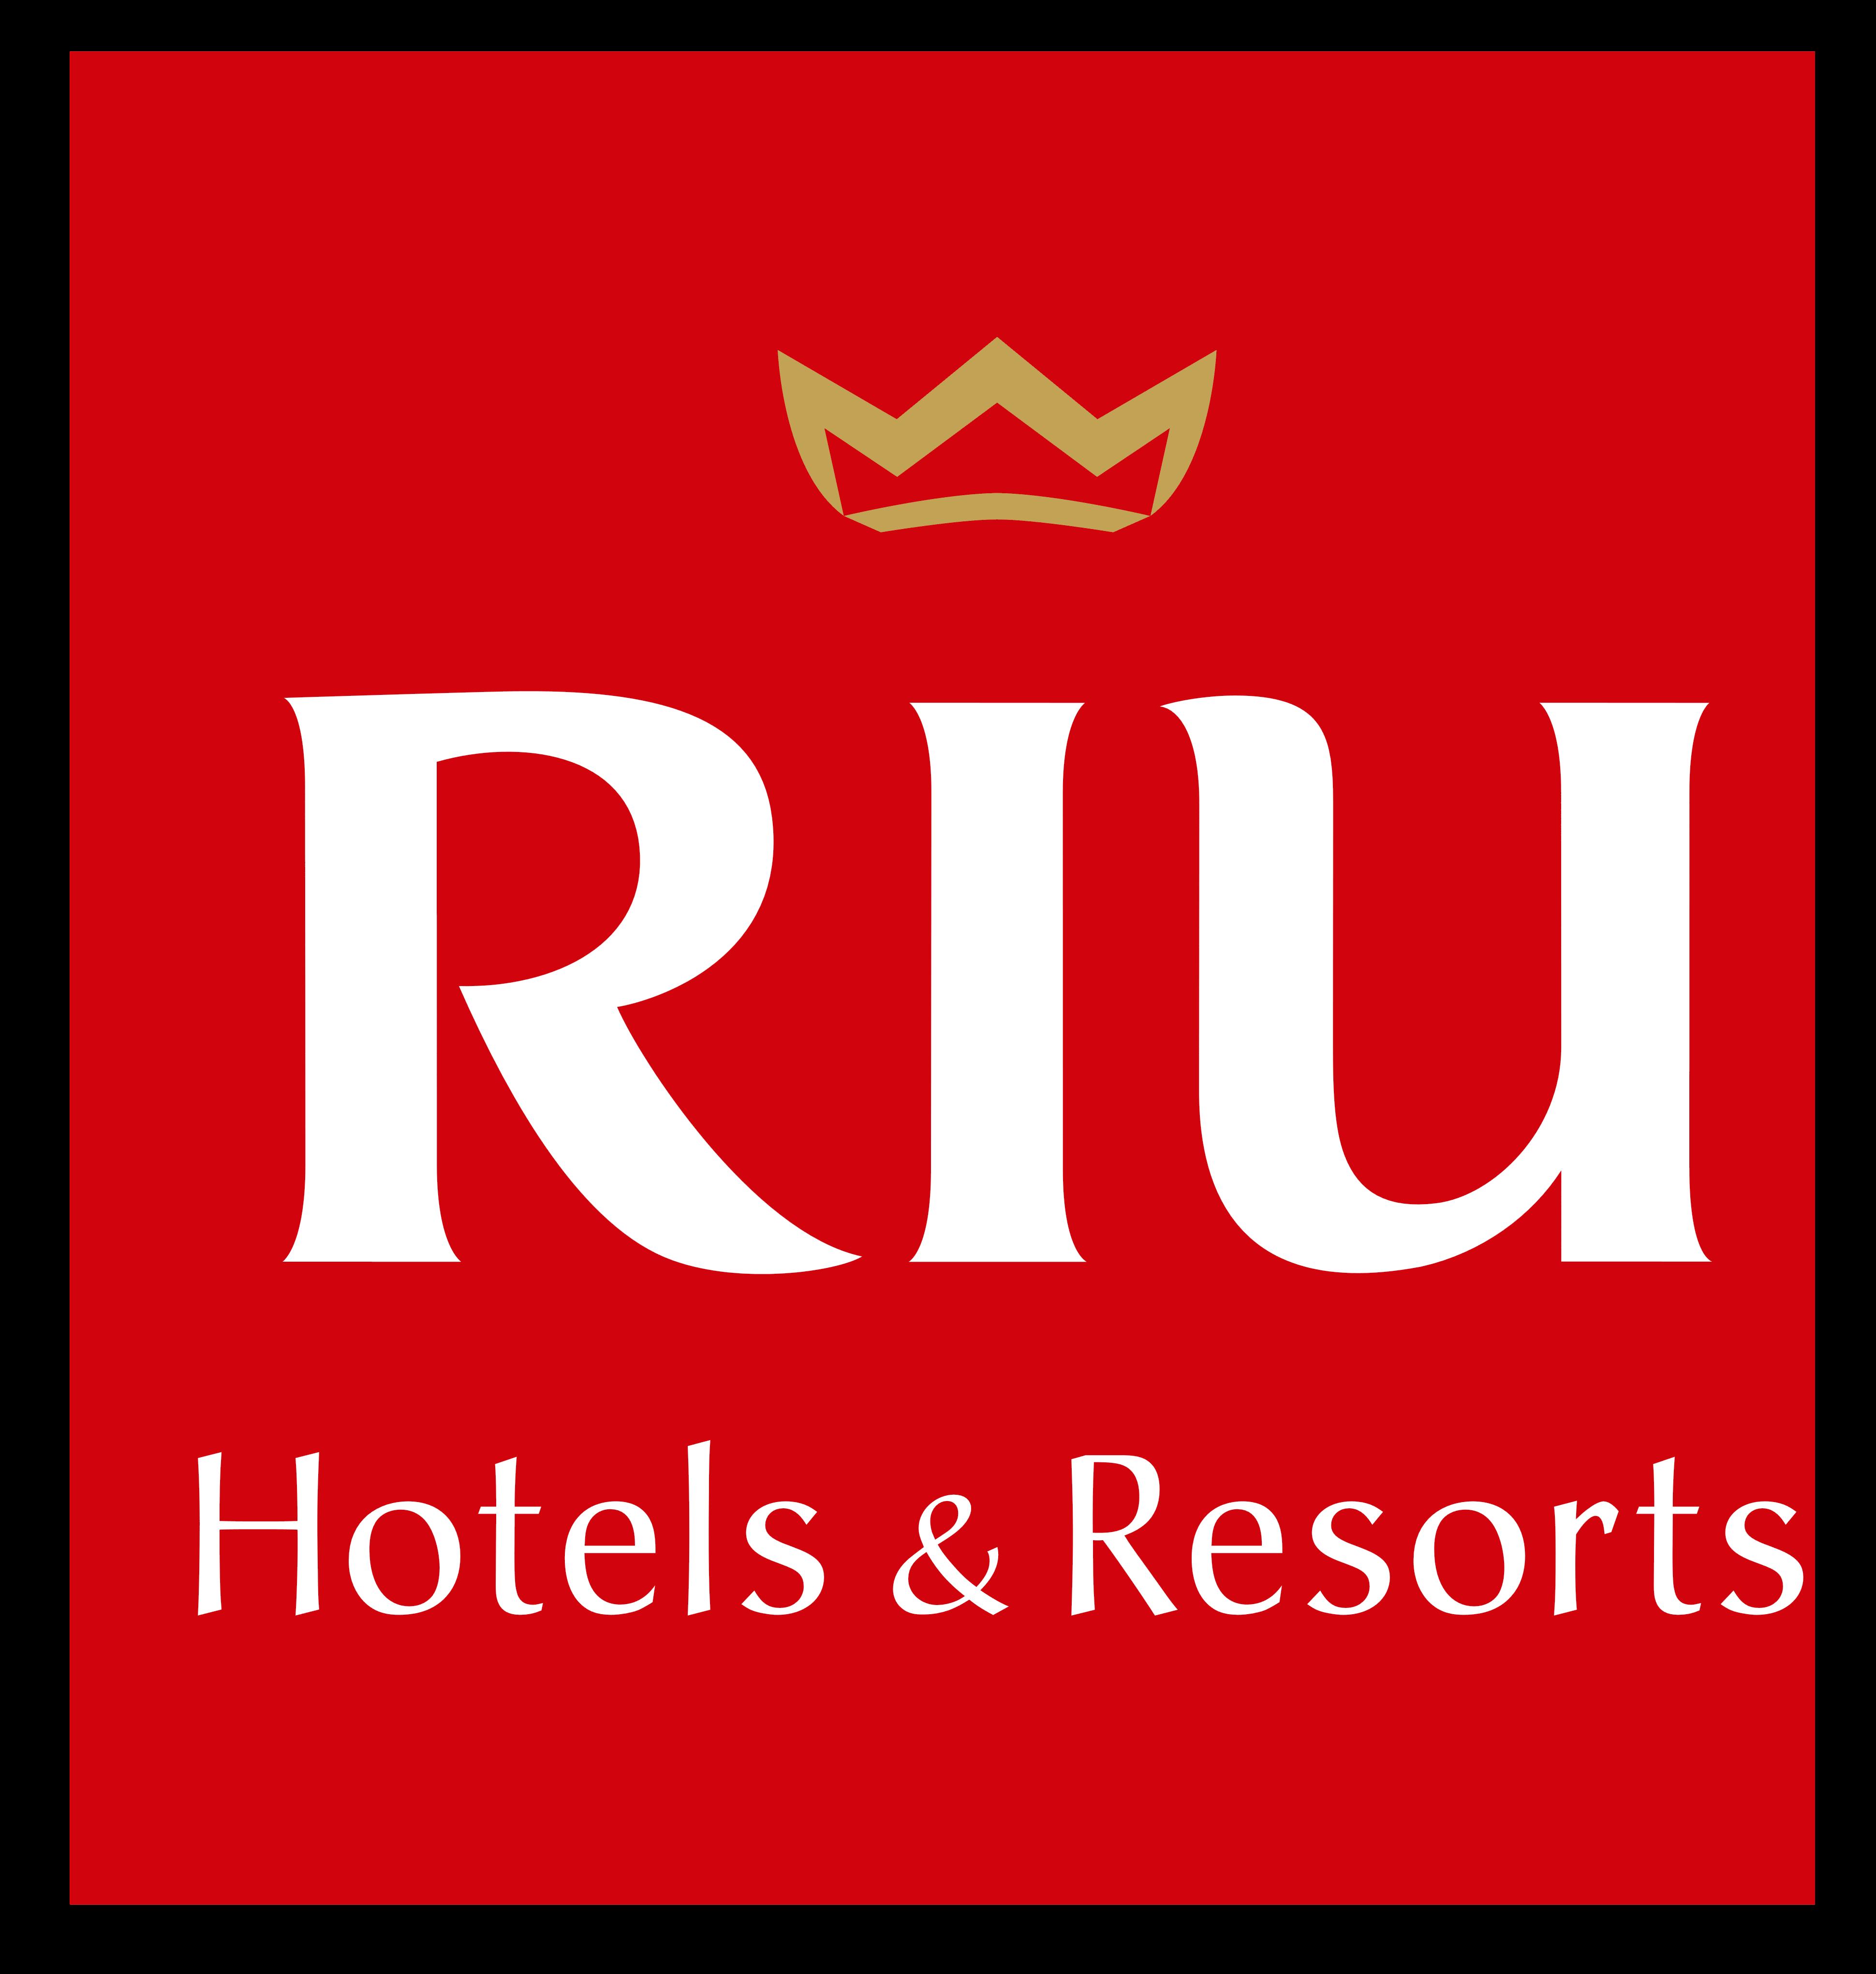 RIU Hotels & Resorts – Logos Download